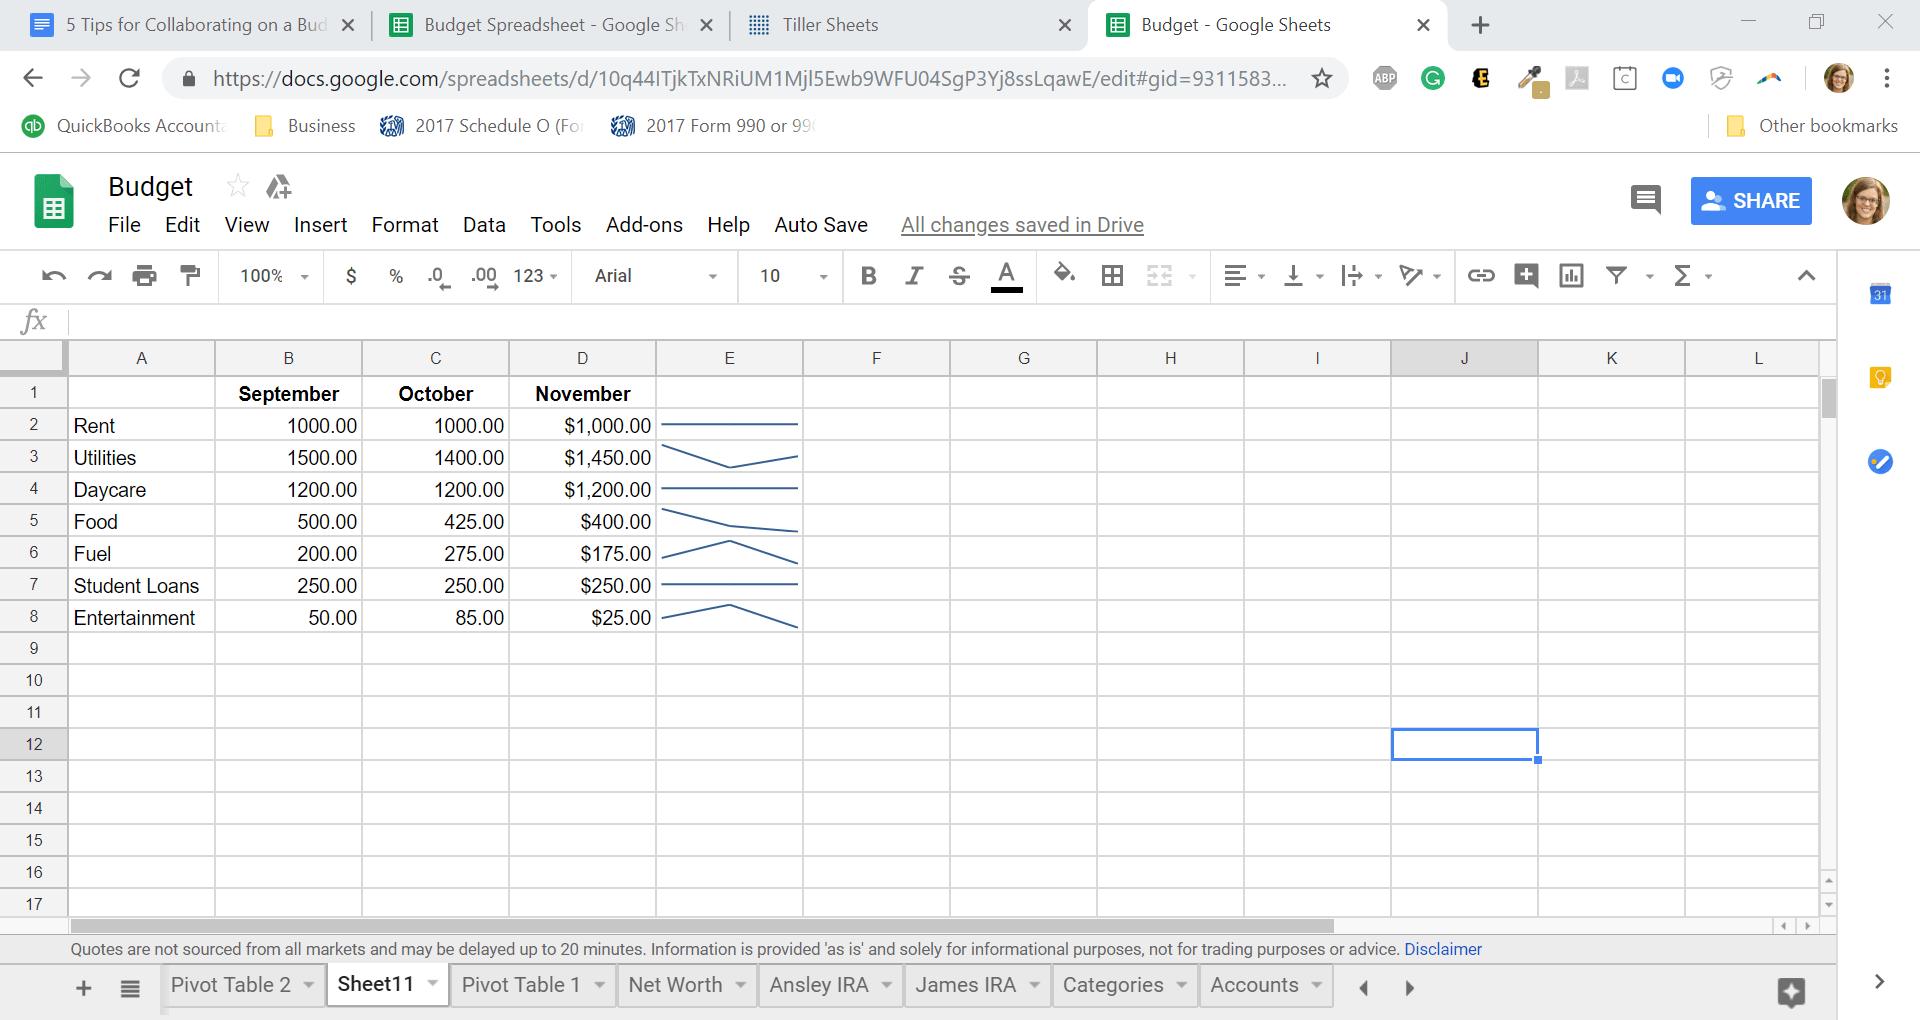 Sparkline chart in shared Google Spreadsheet